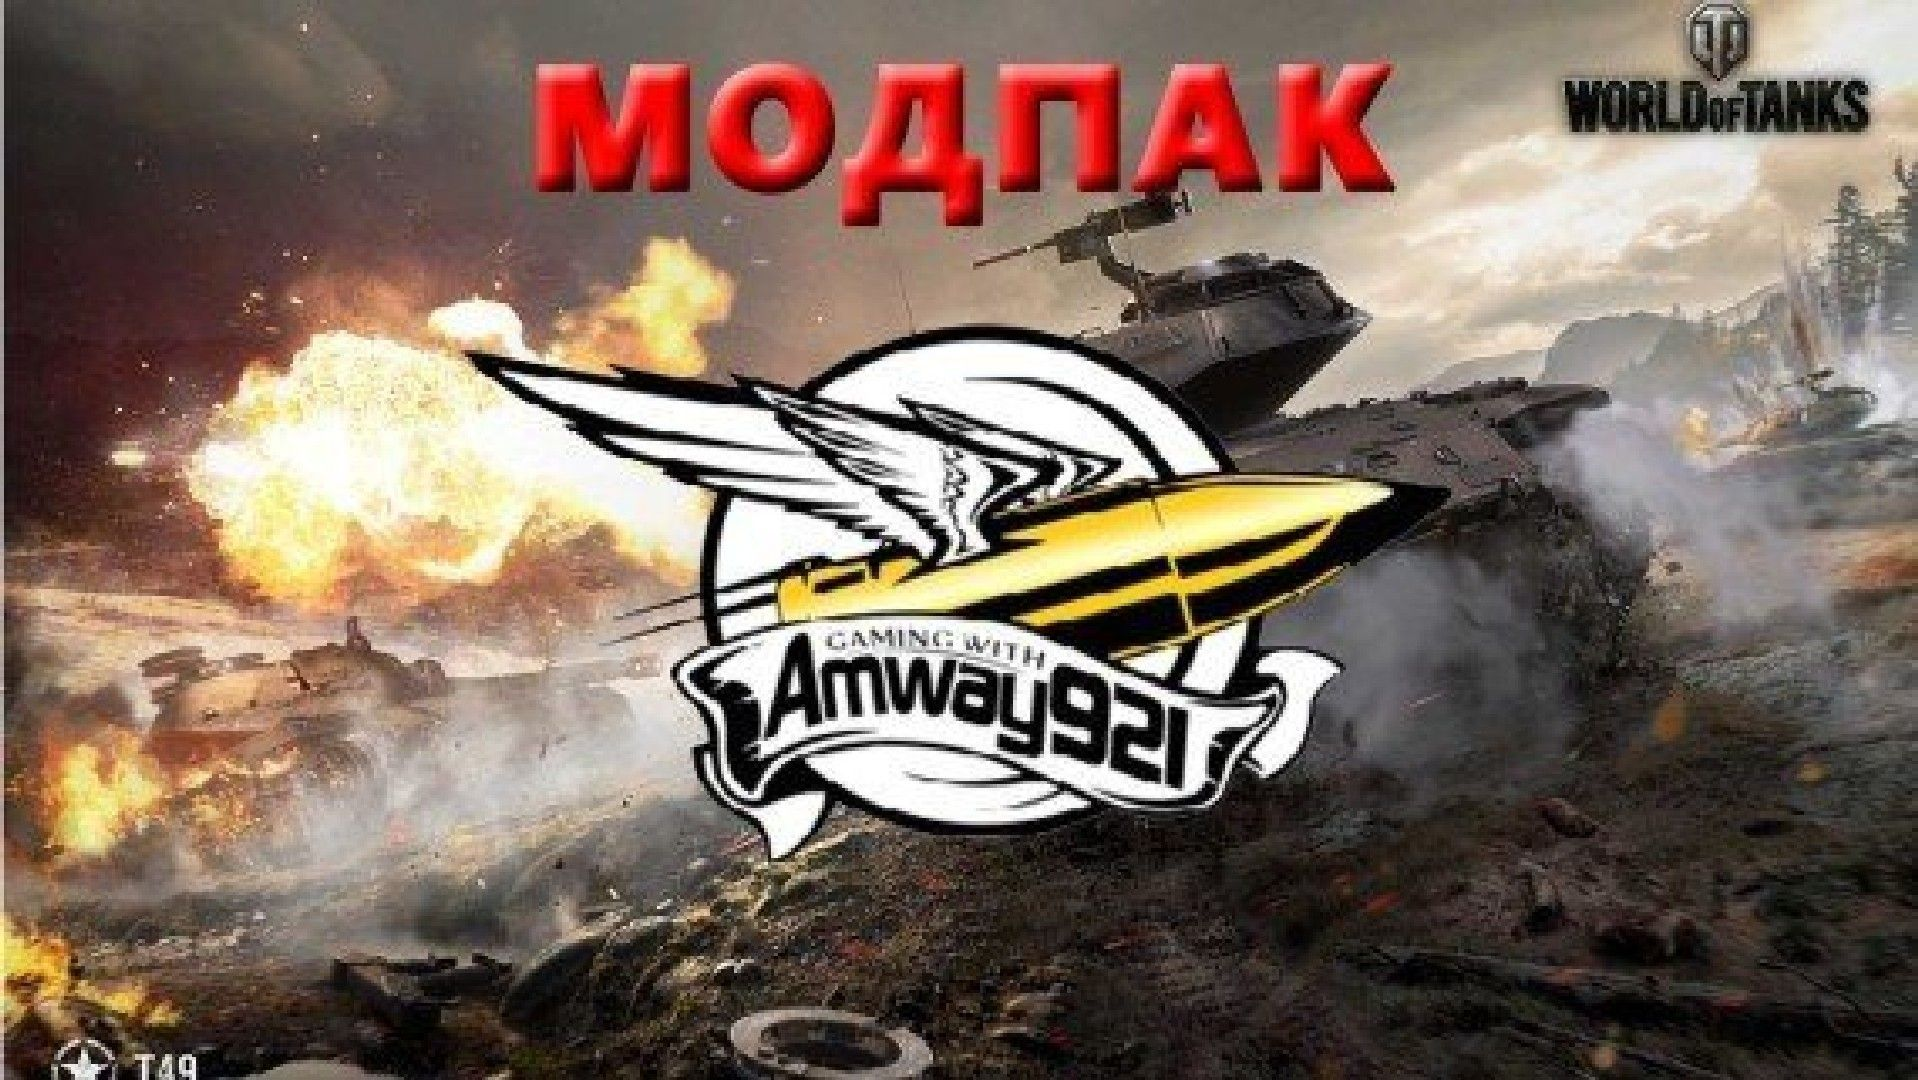 Modpak-Amway921.jpg